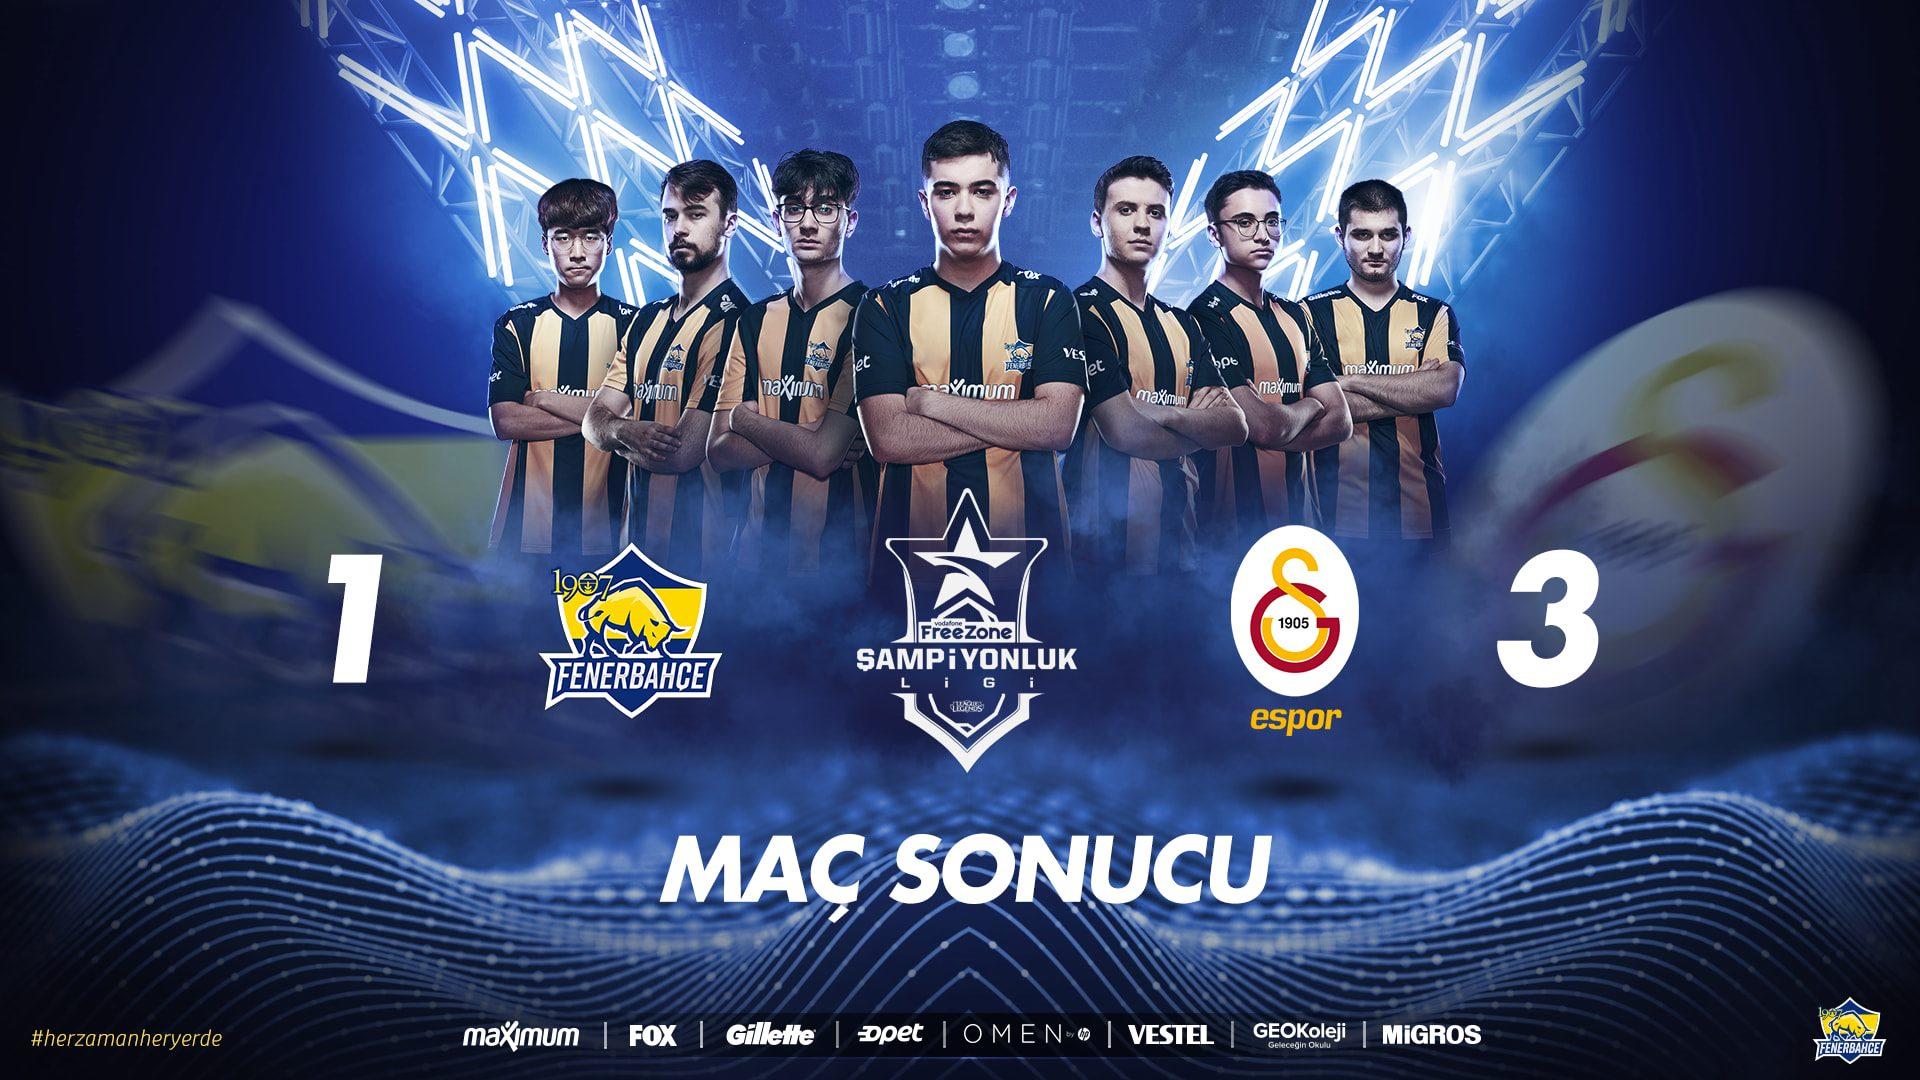 Fenerbahçe vs Galatasaray Espor LoL